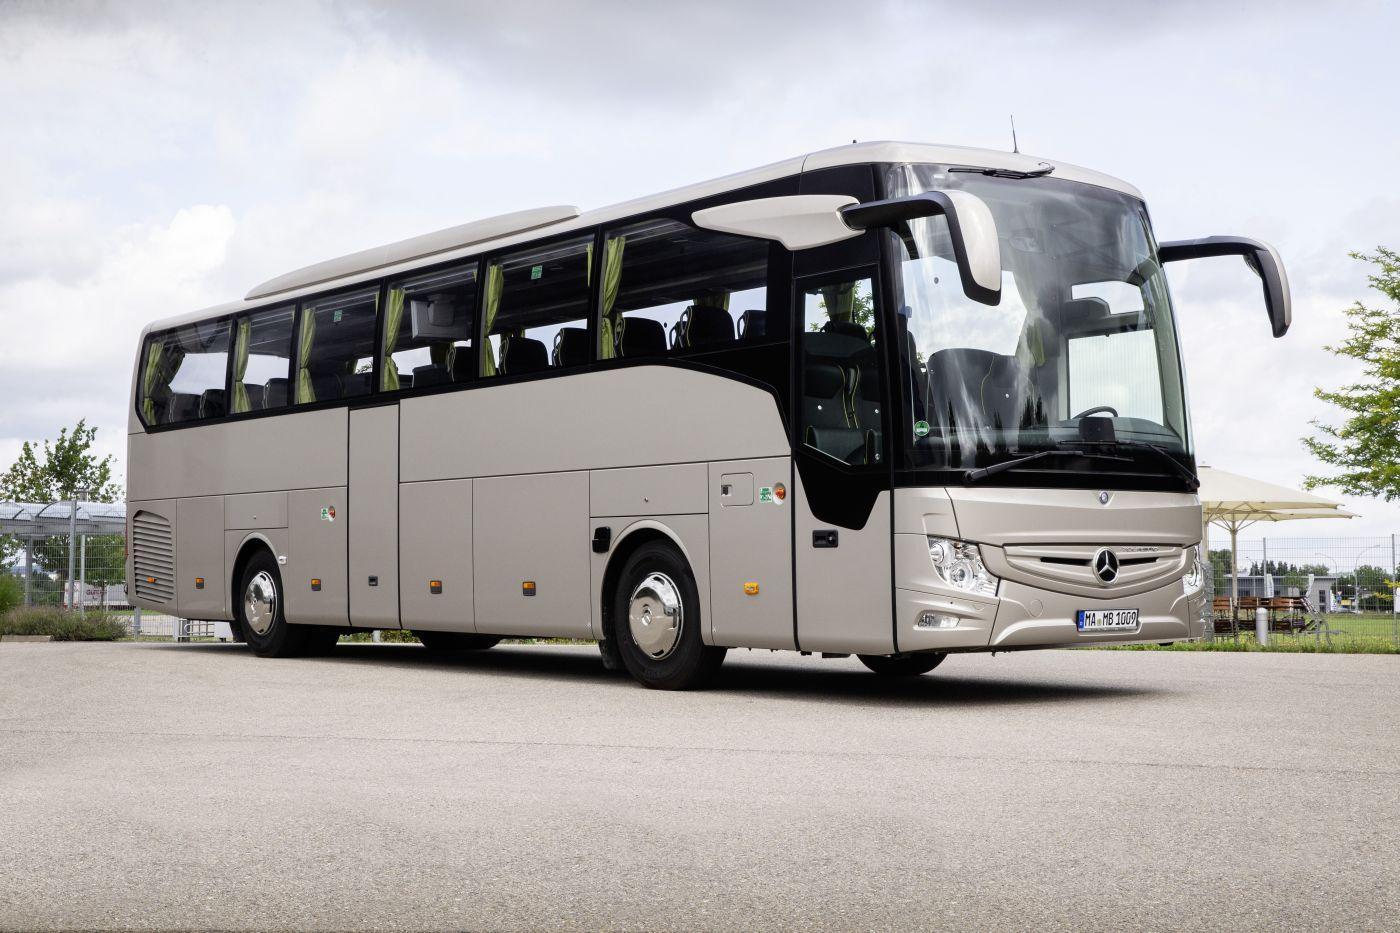 Mercedes-Benz Tourismo kroz 25 godina tradicije do titule najprodavanijeg autobusa u Europi